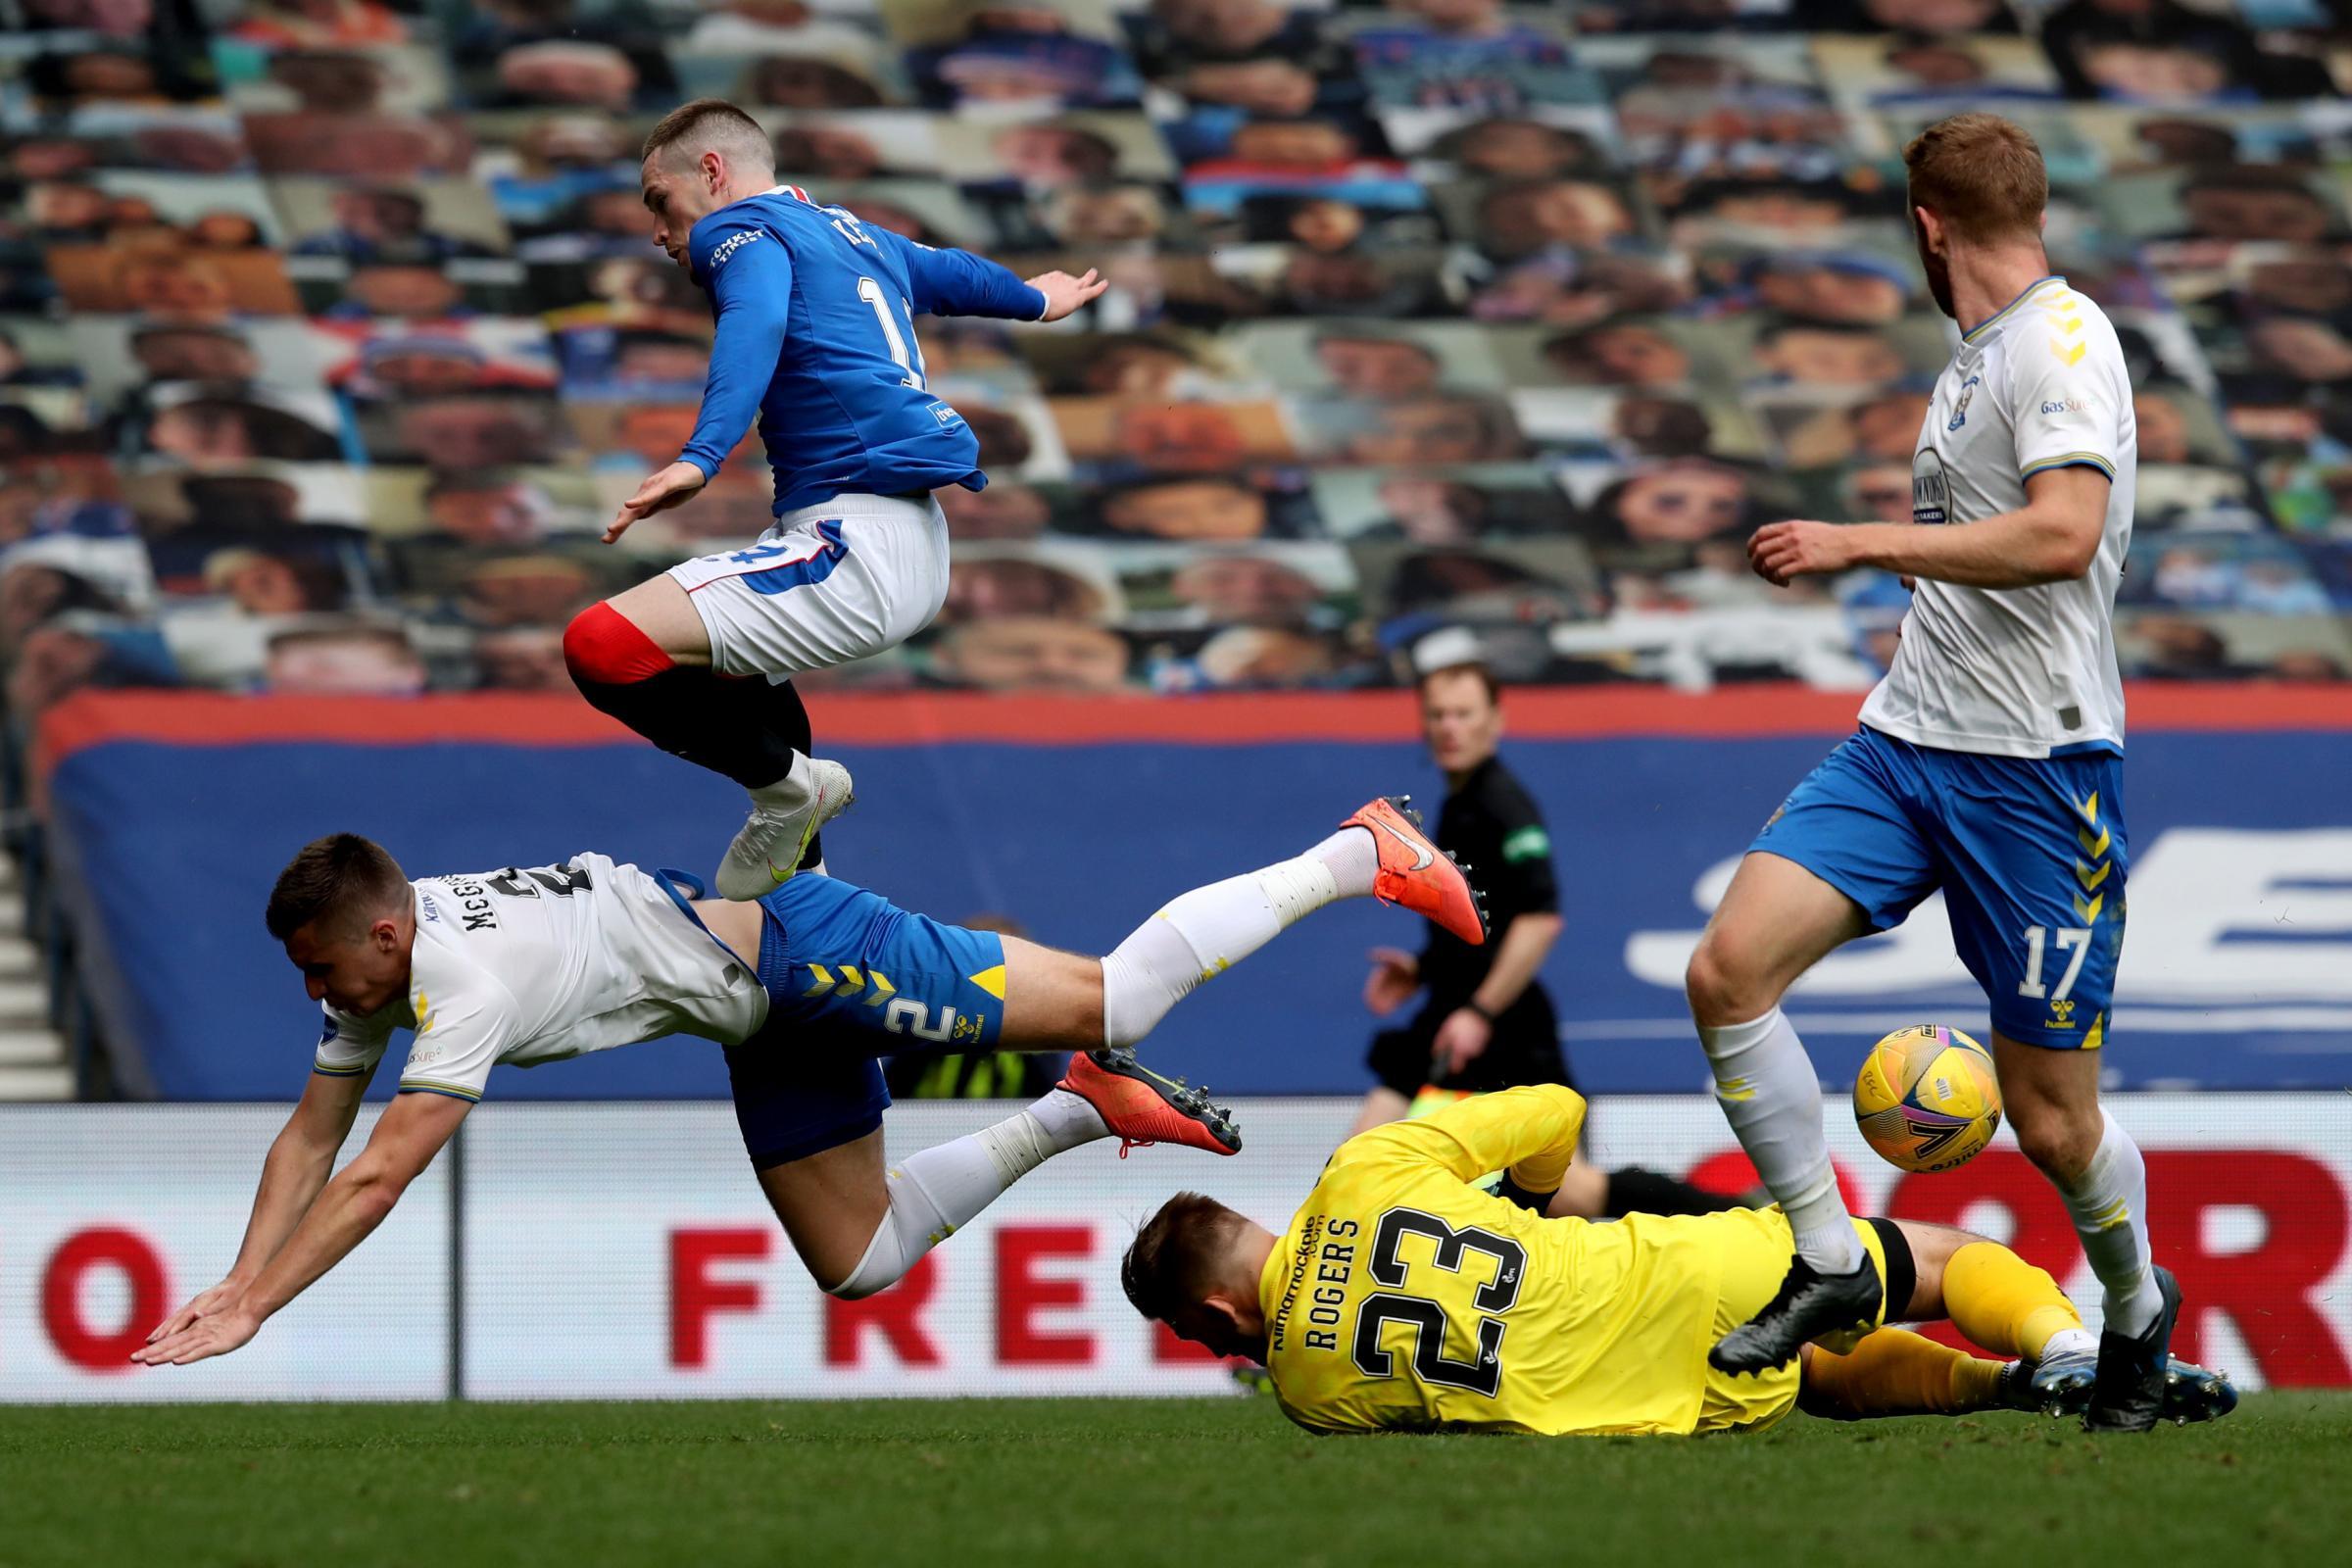 Rangers 2-0 Kilmarnock: Three things we learned as Steven Gerrard's side earn comfortable Ibrox win